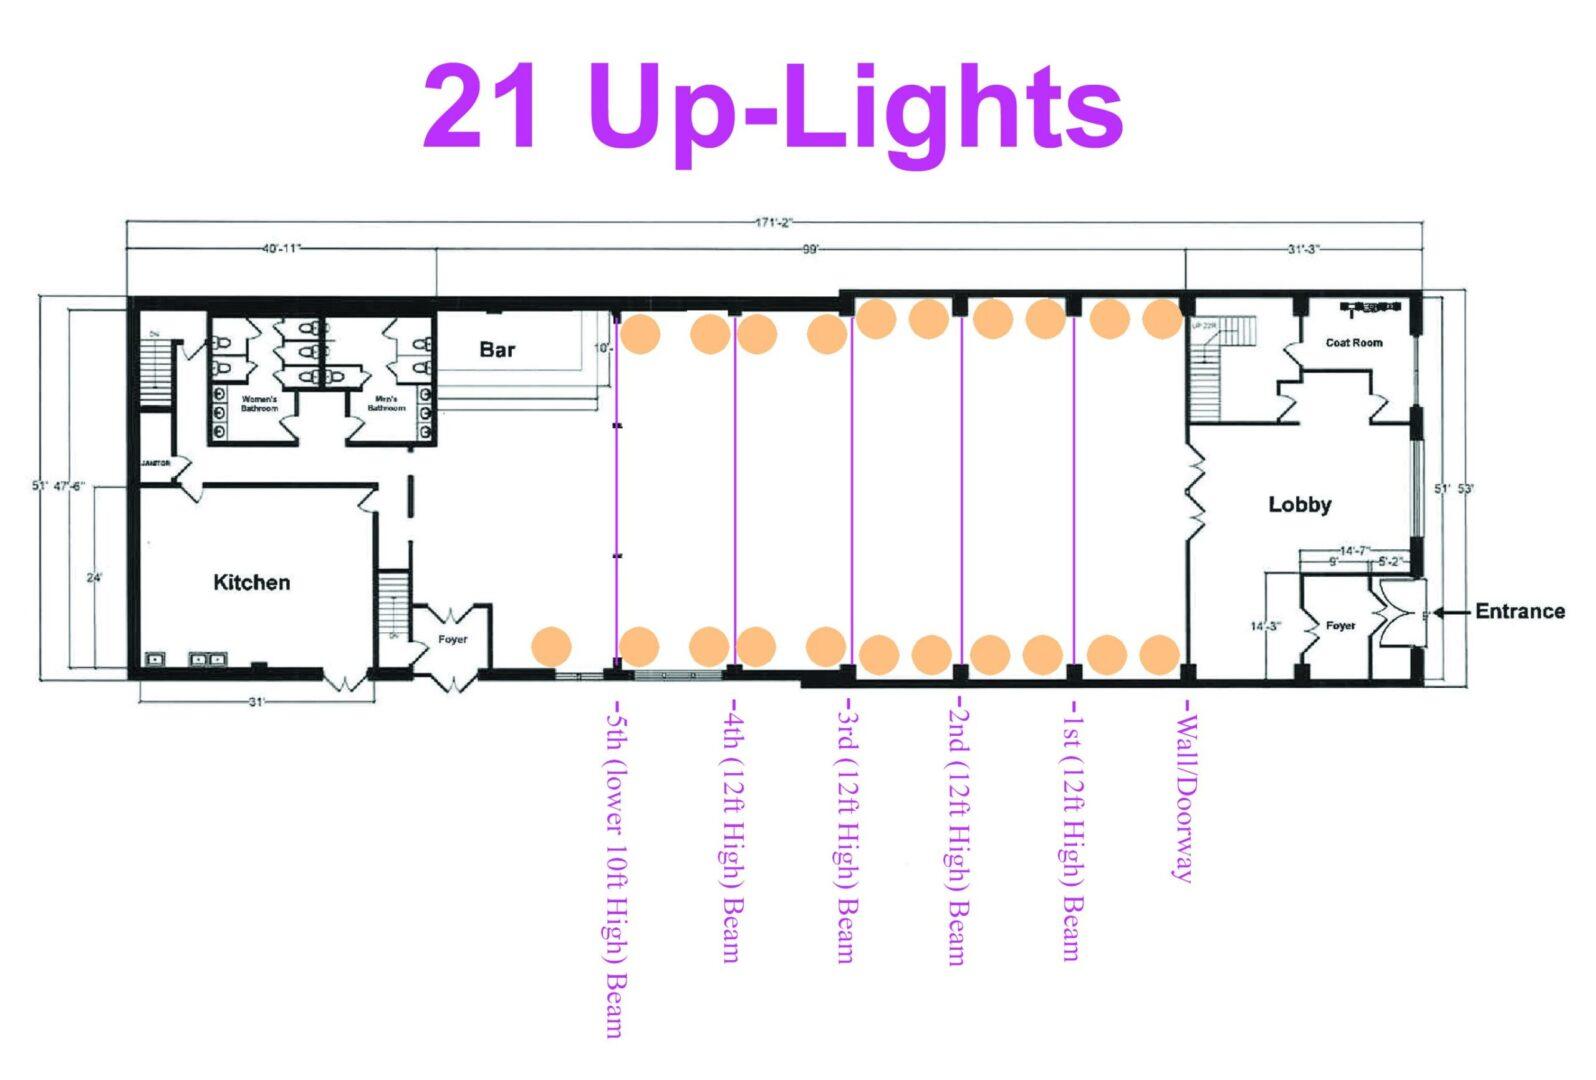 26 Bridge (21 Up-Lights)